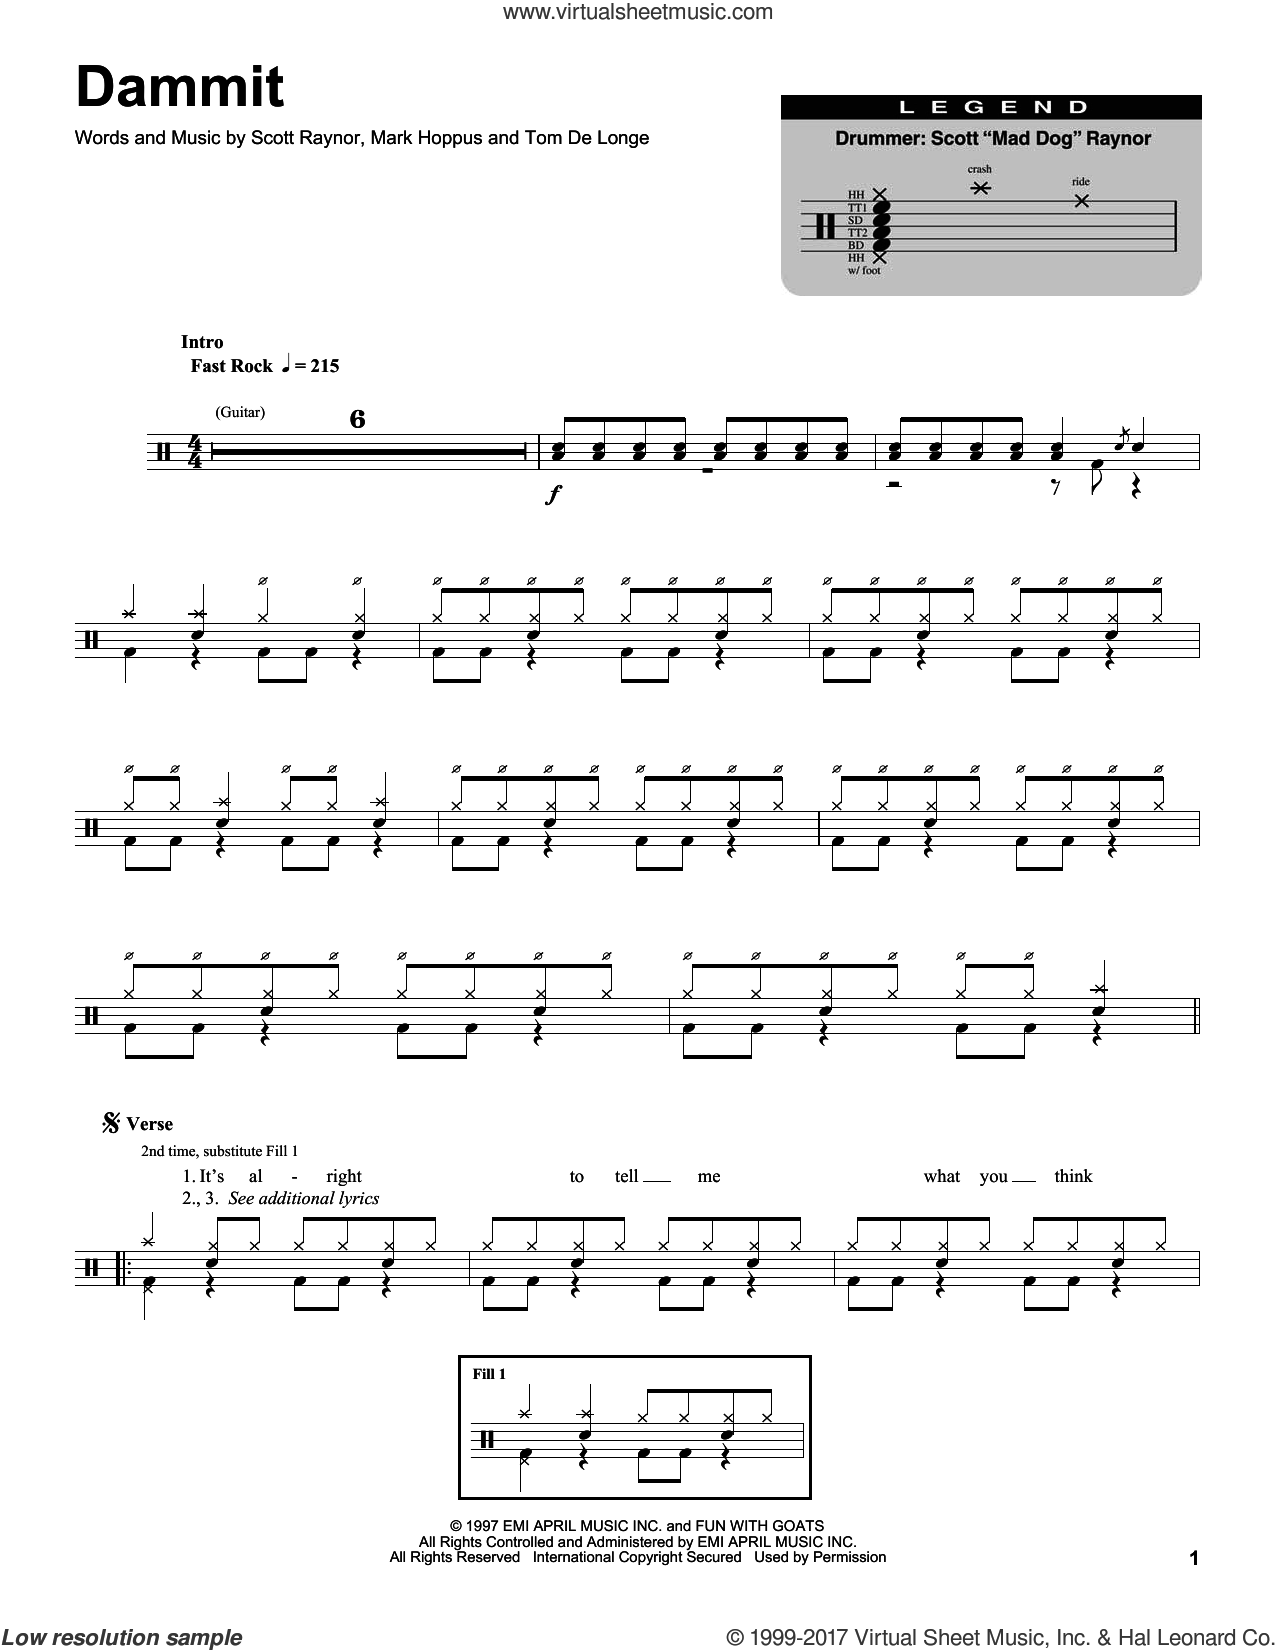 Dammit sheet music for drums by Blink 182, Mark Hoppus, Scott Raynor and Tom DeLonge, intermediate skill level